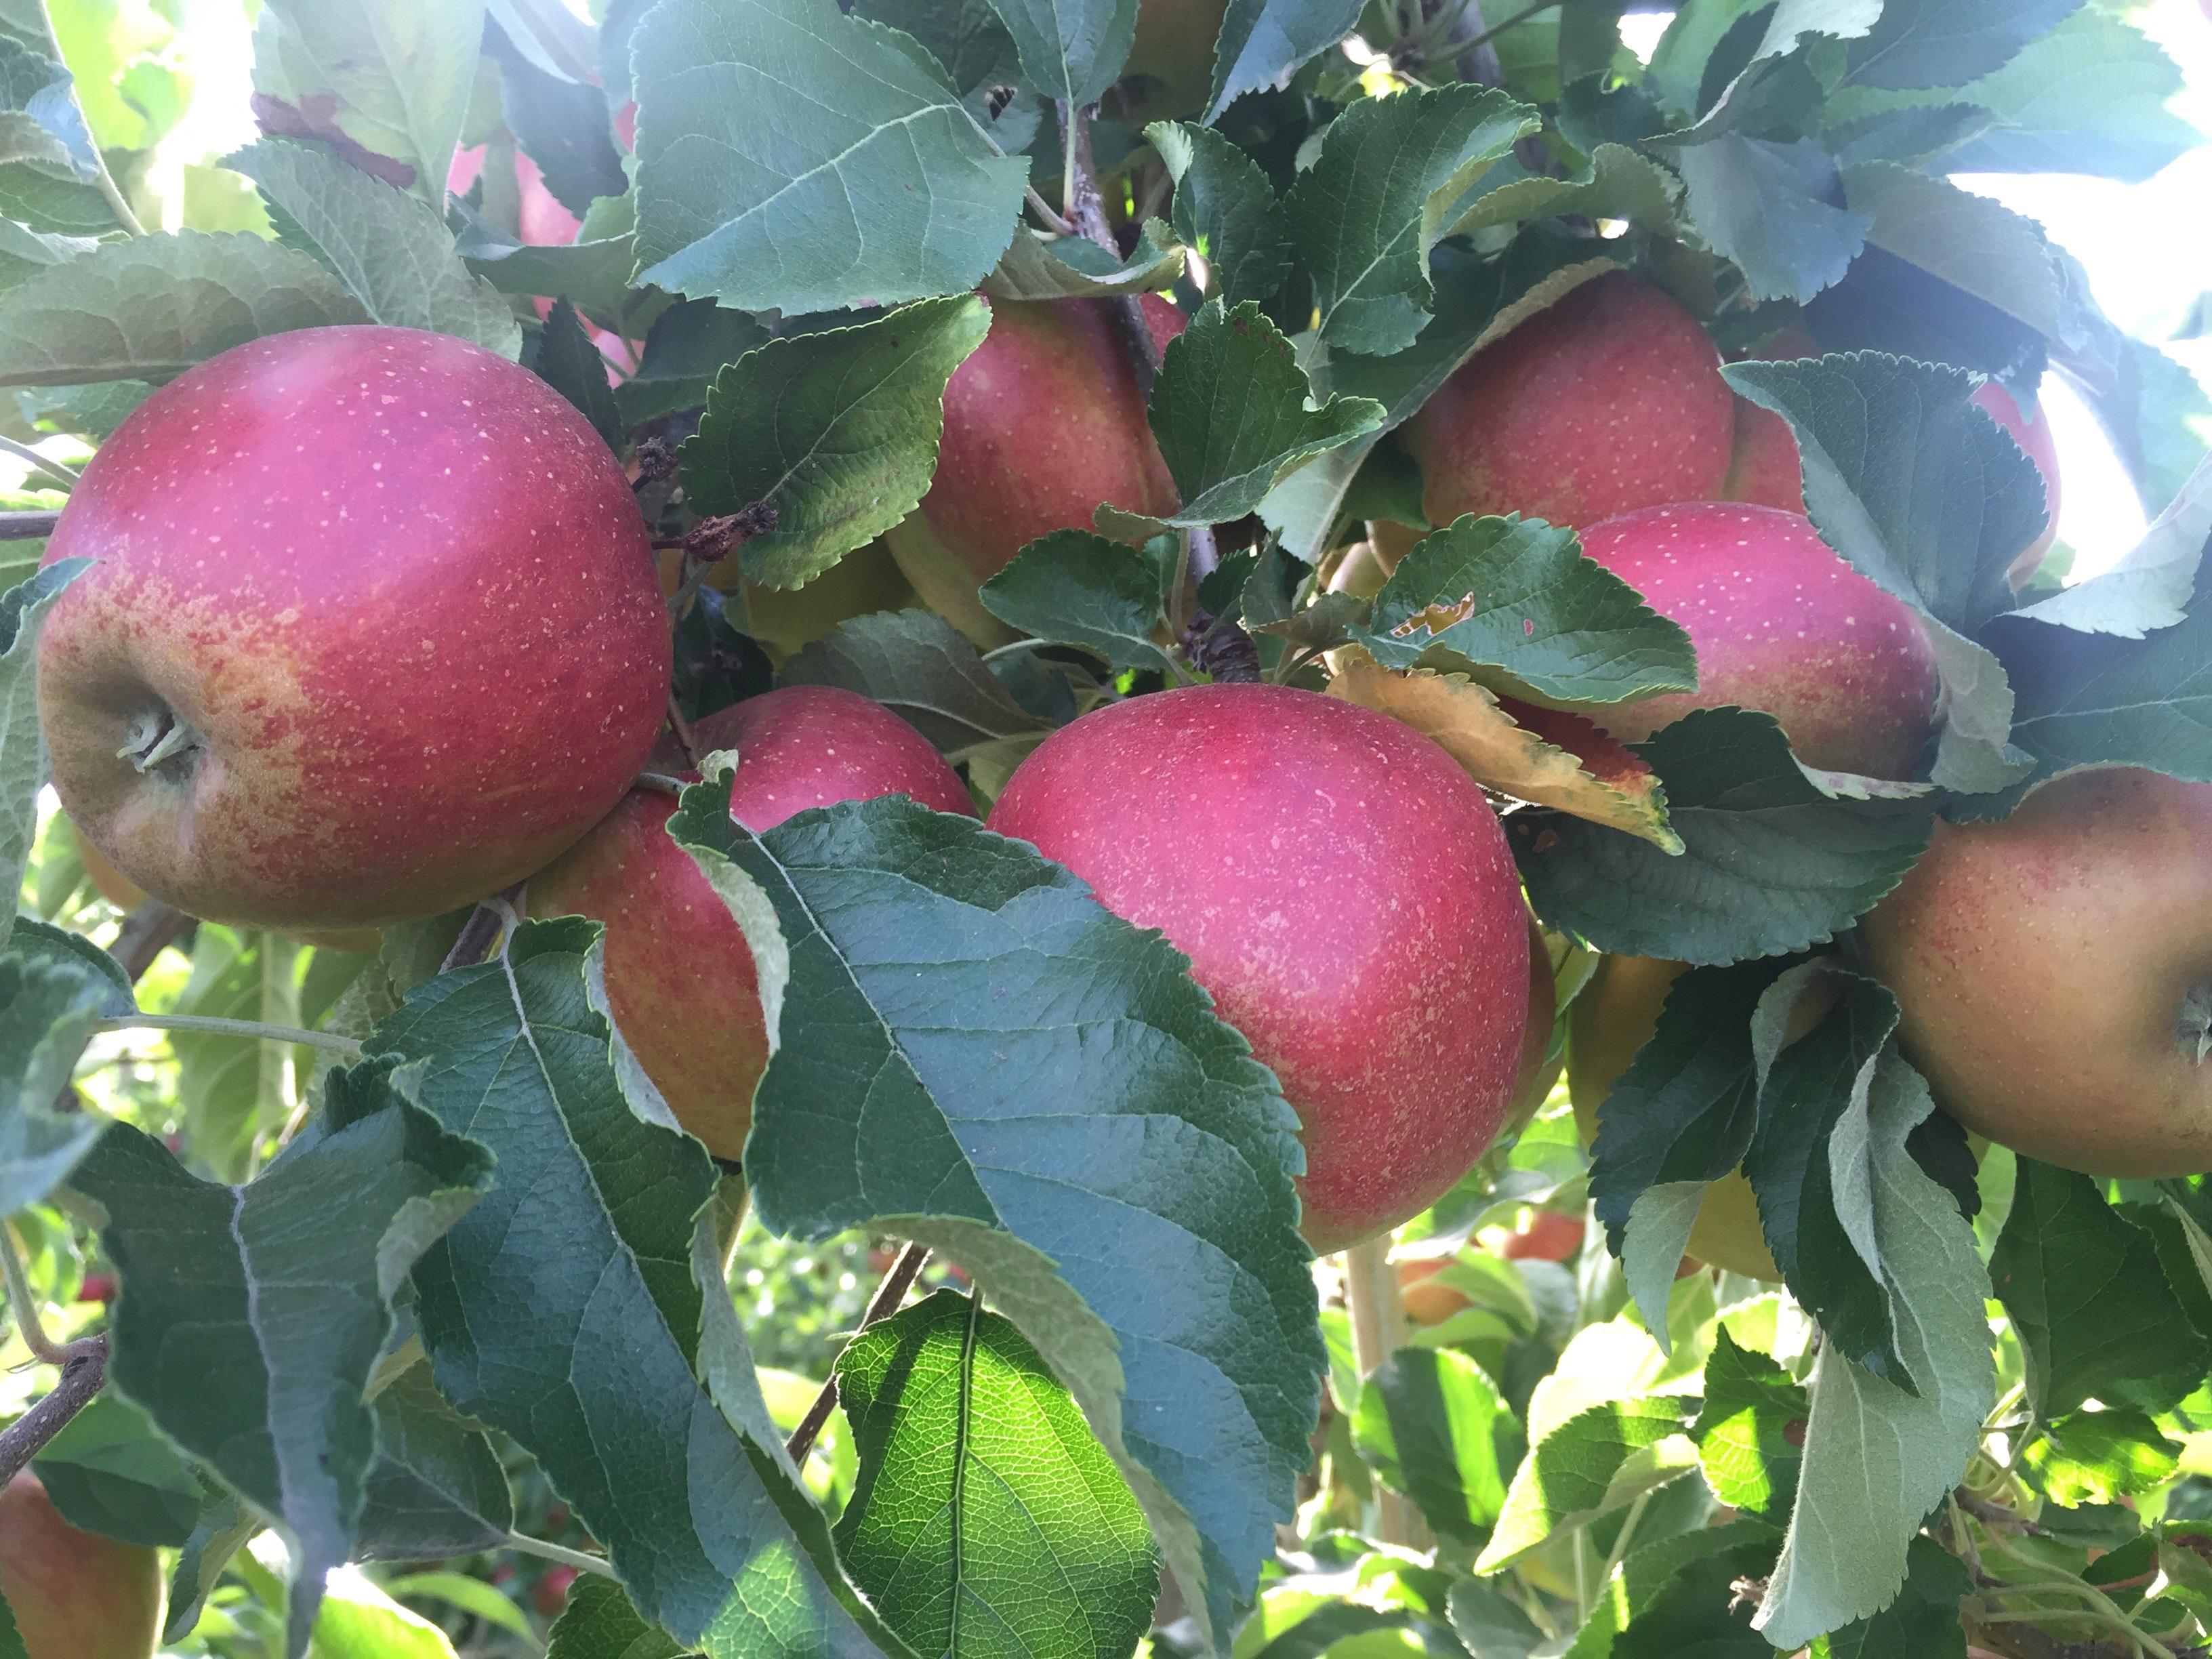 Rote reife Äpfel am Baum